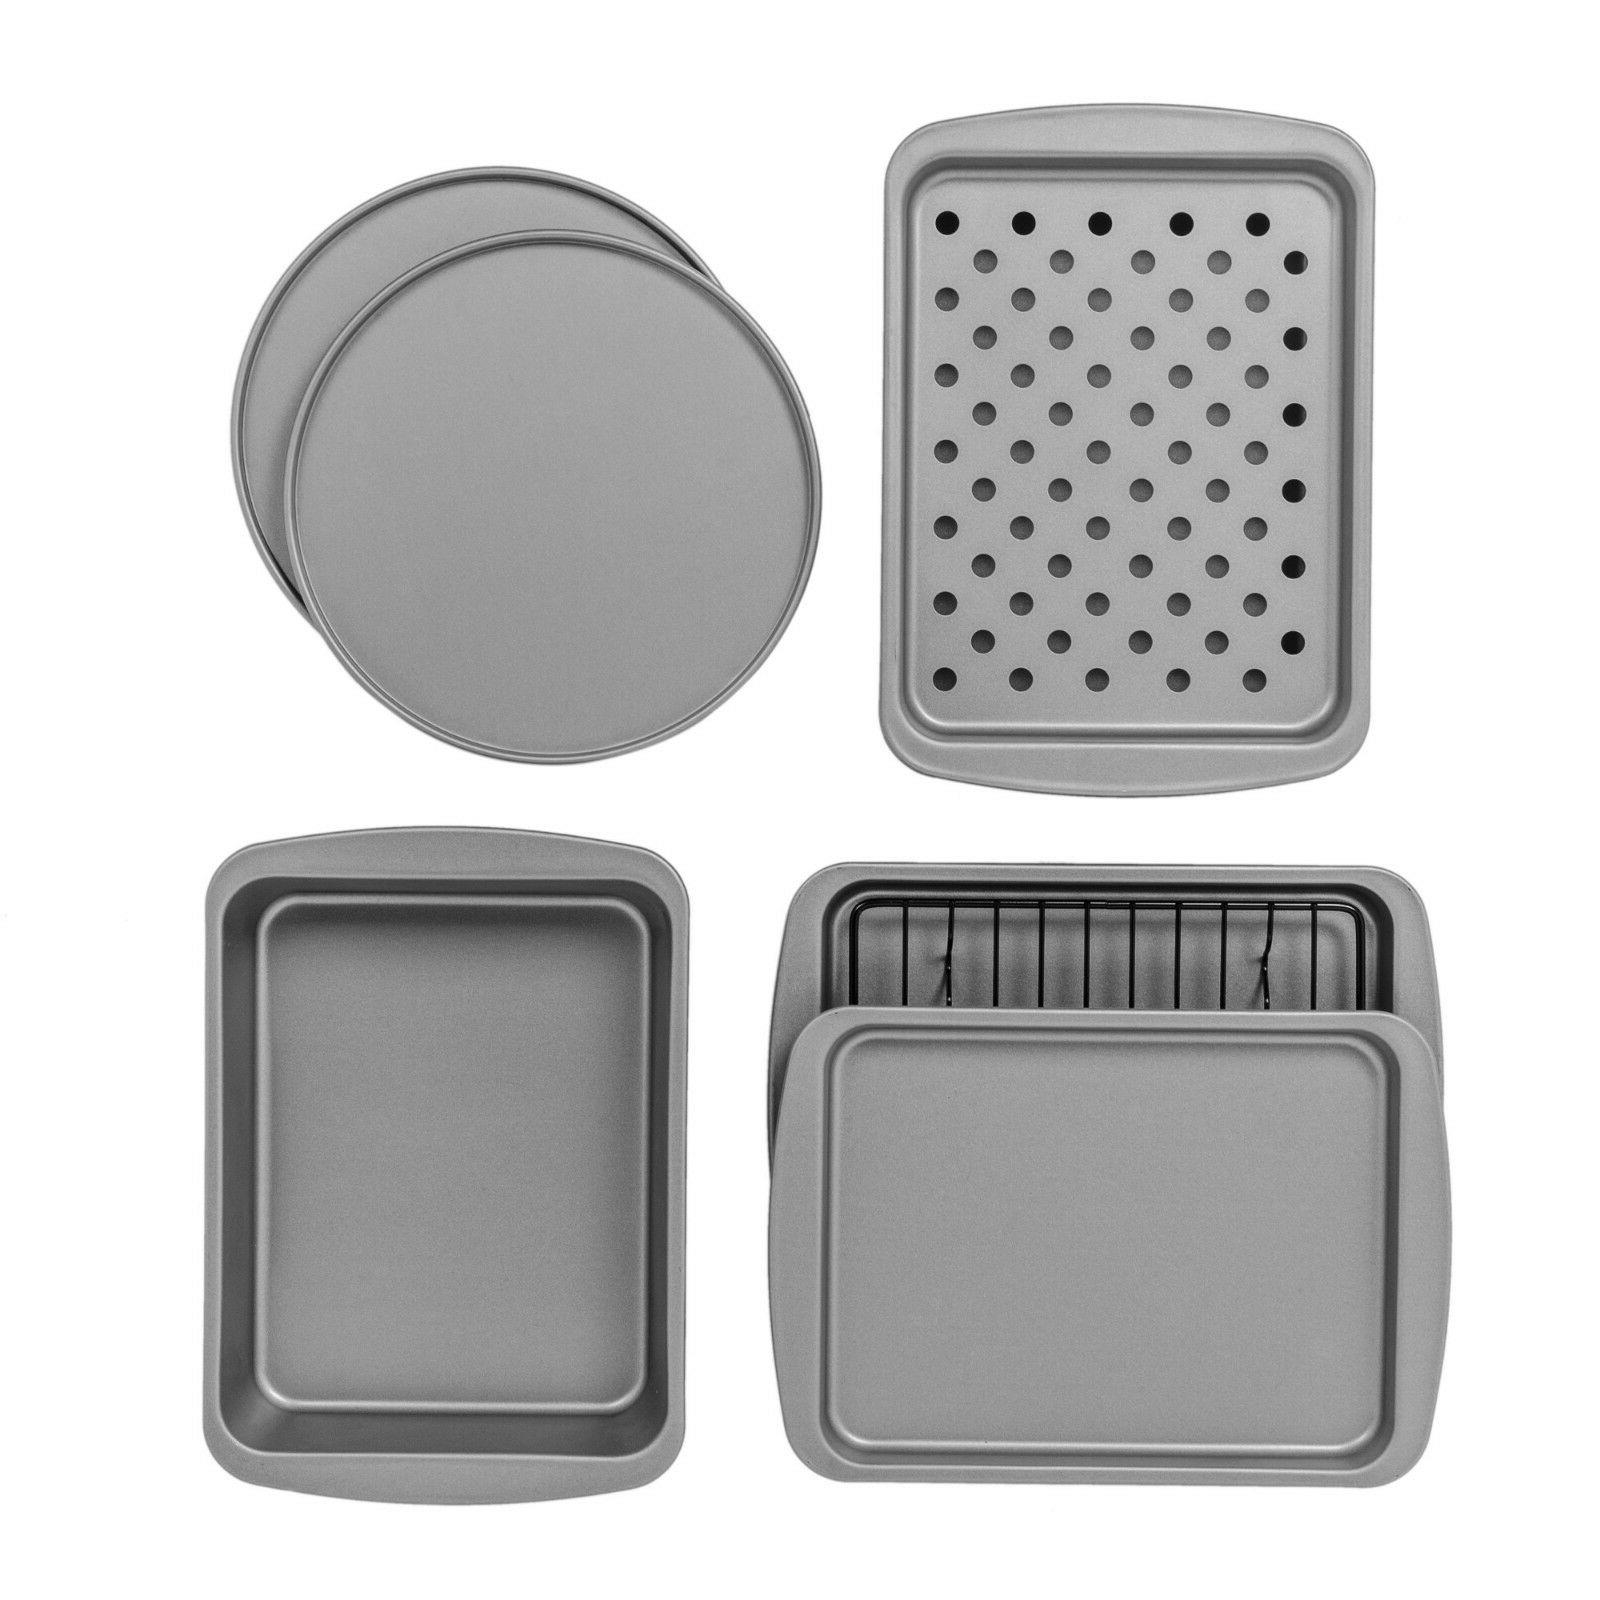 NEWBakerEze 8-Piece Non-stick Toaster Oven Bakeware Set, Piz